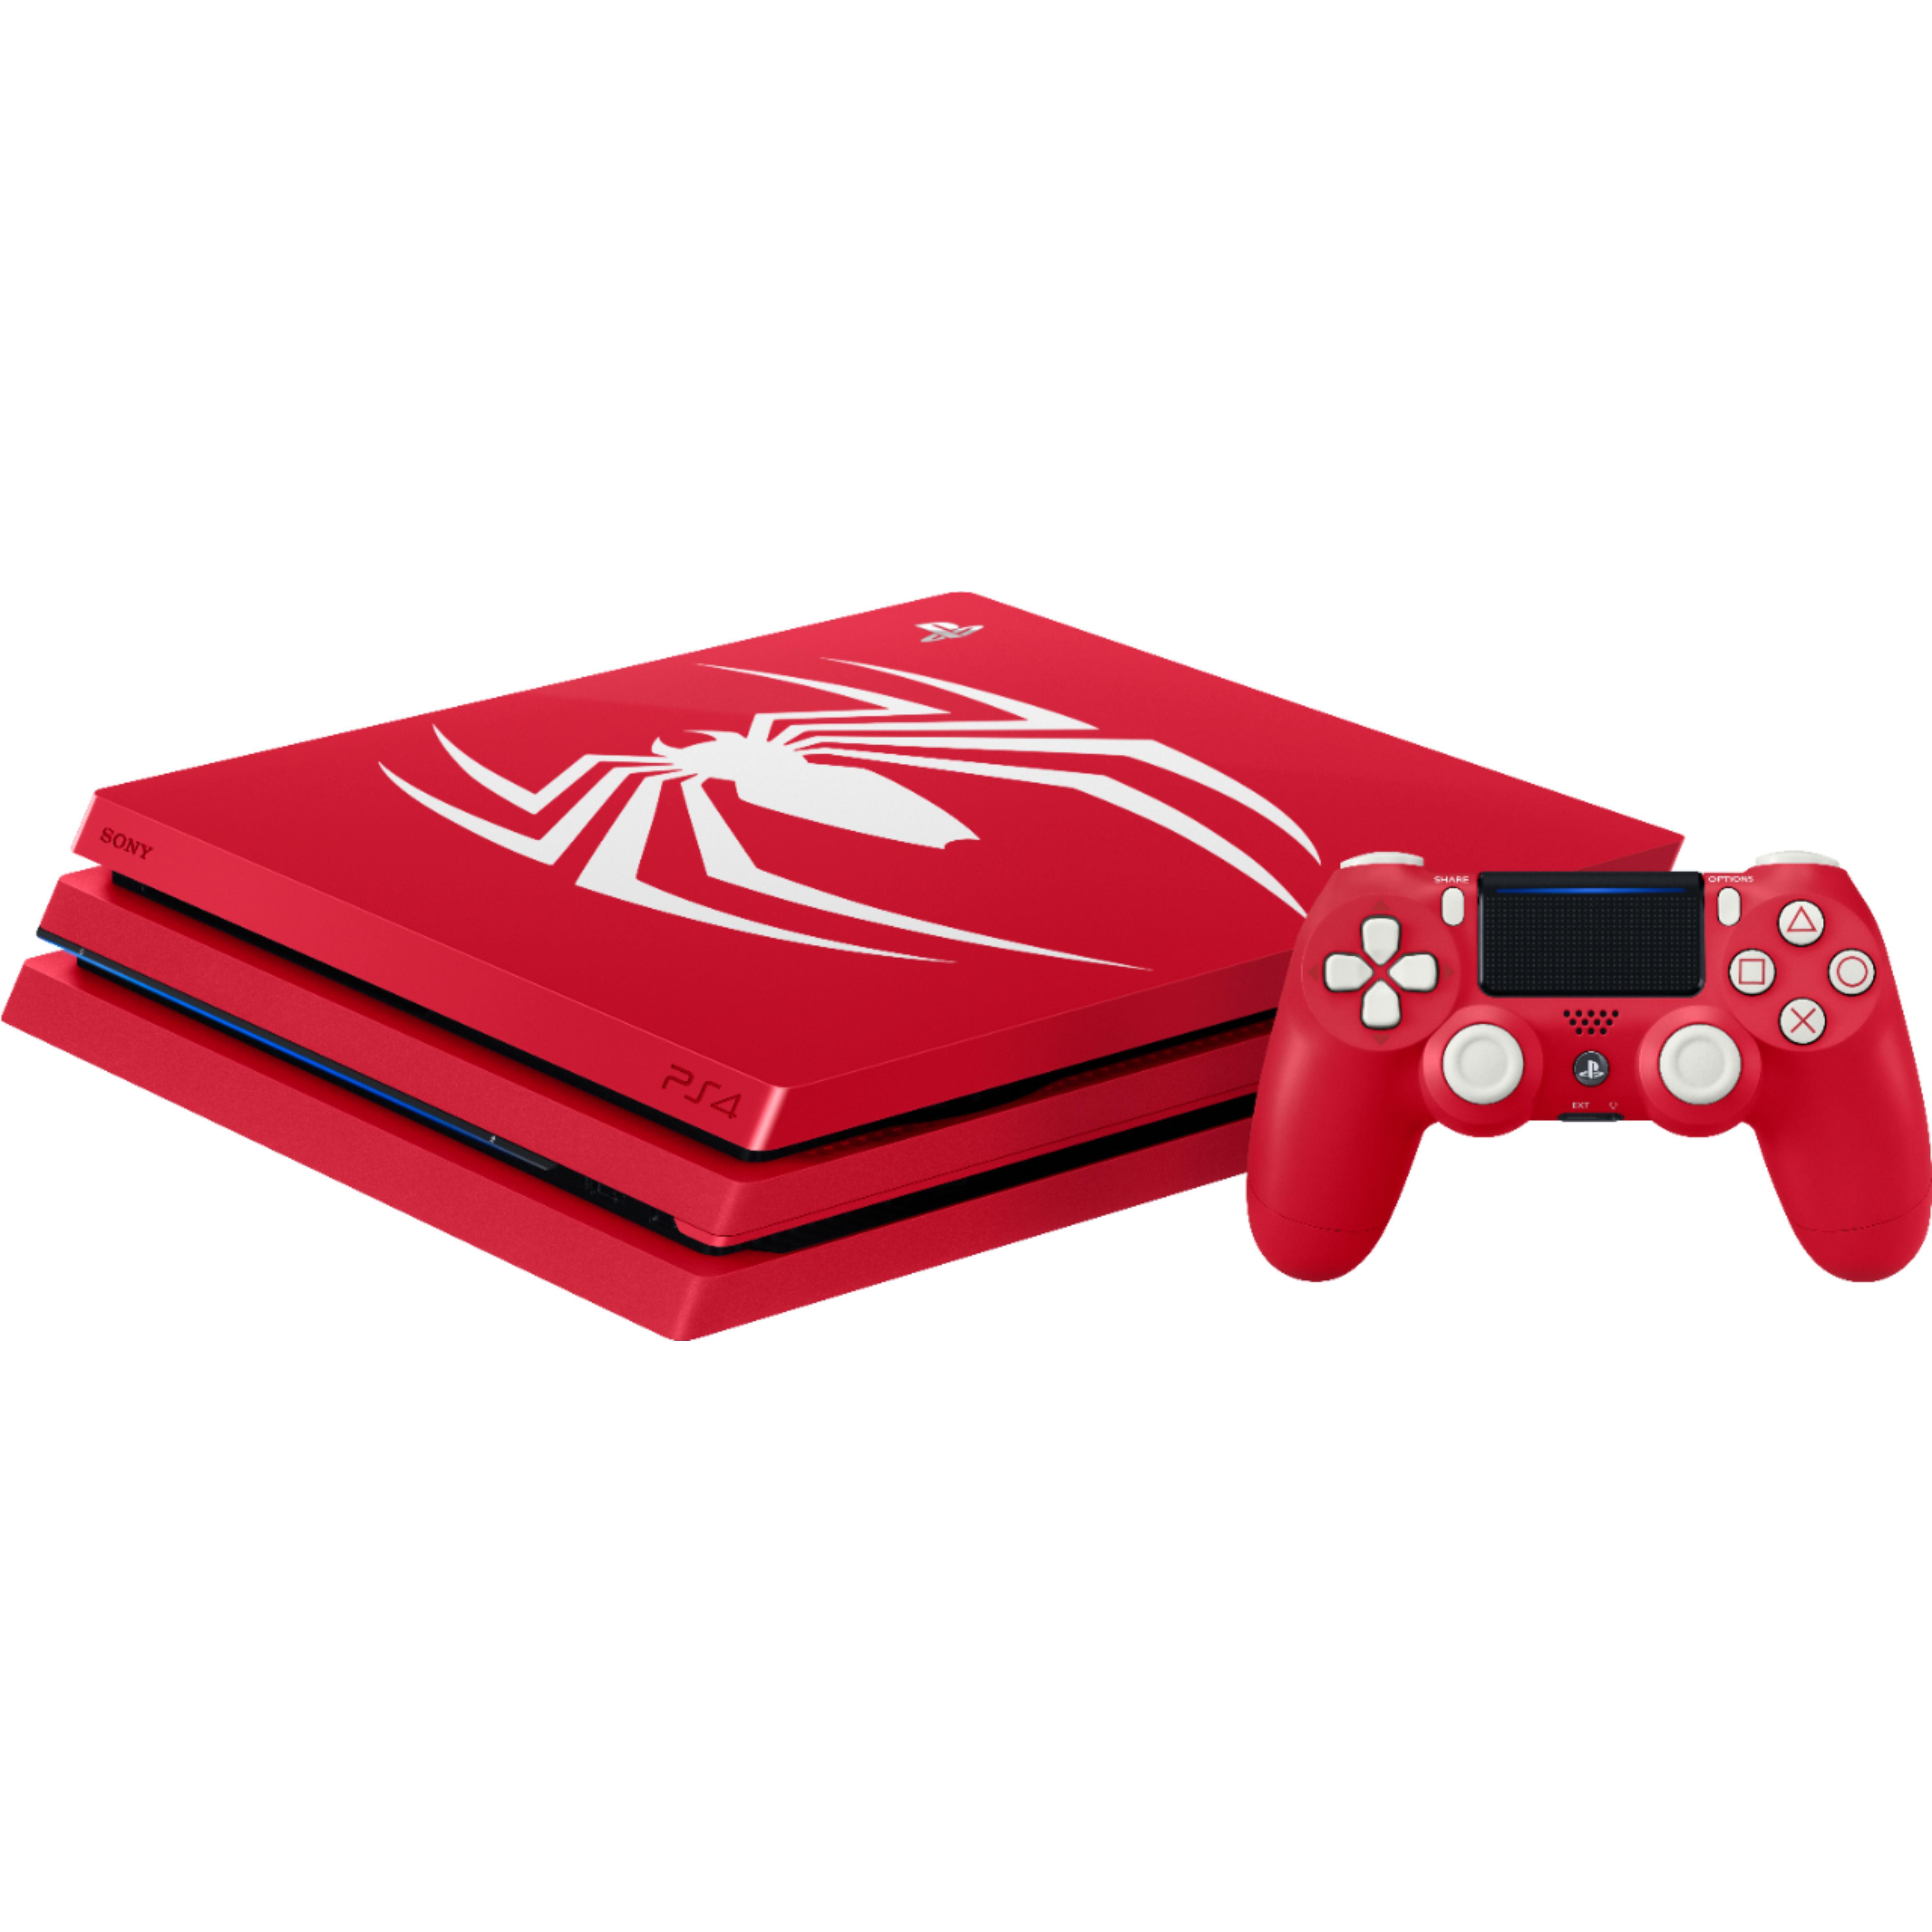 PlayStation 4 Slim - HDD 1 TB - Röd